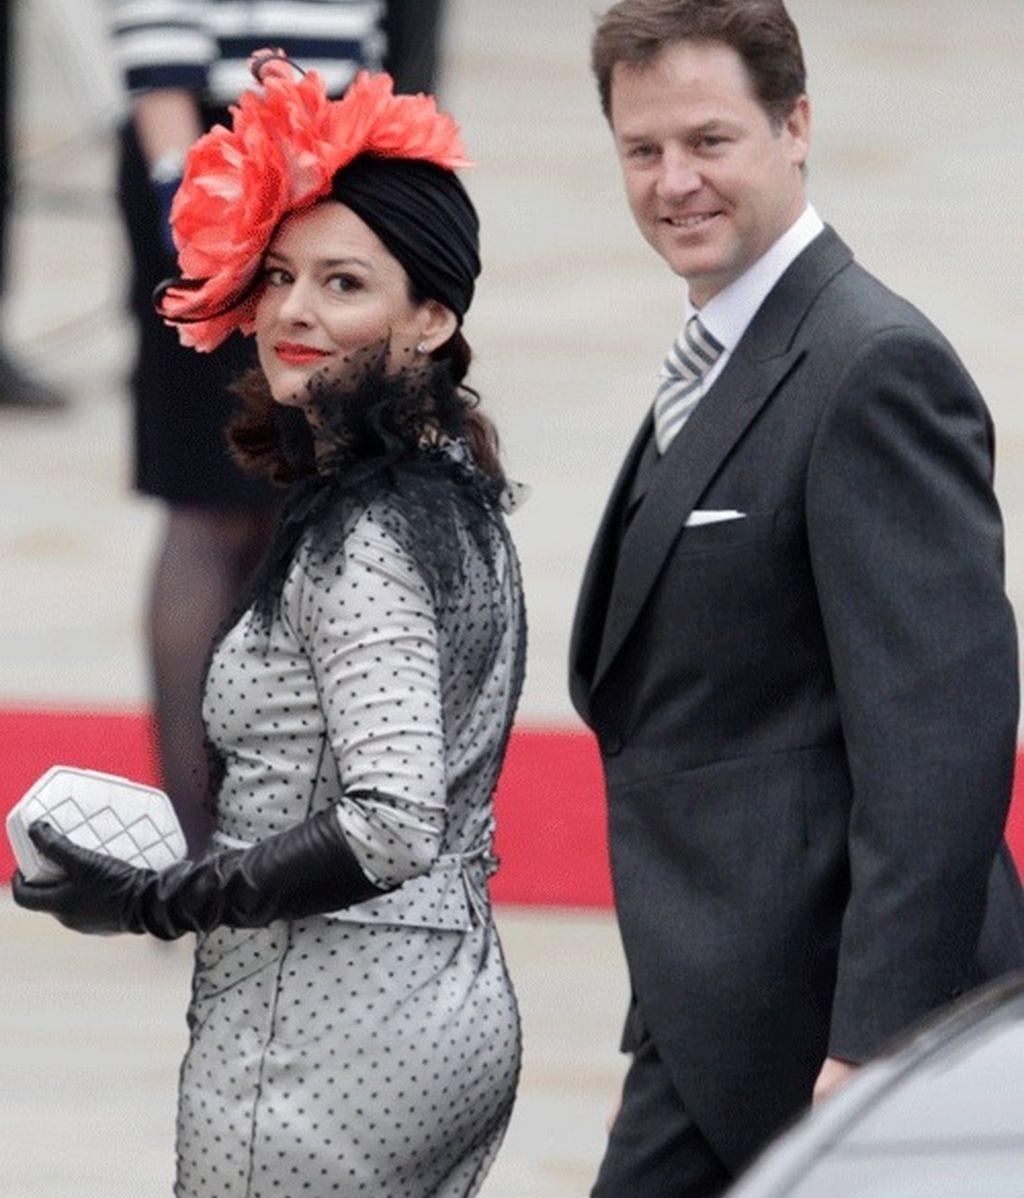 Frikis en la boda real inglesa